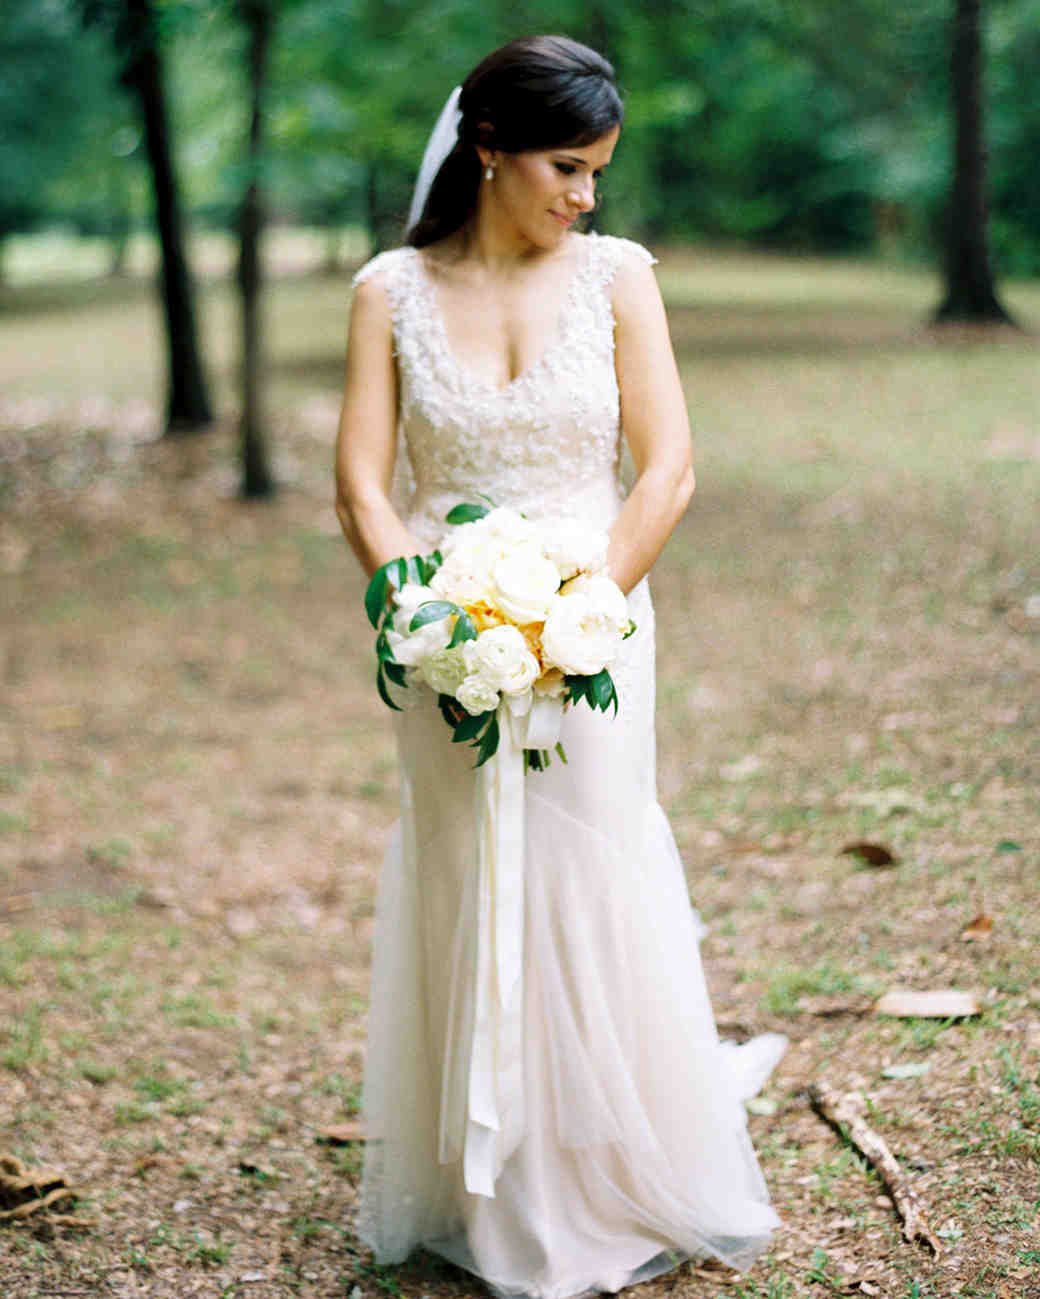 The Best Hairstyles For Every Wedding Dress Neckline Martha Stewart Weddings: Wedding Dress With Long Hair At Reisefeber.org